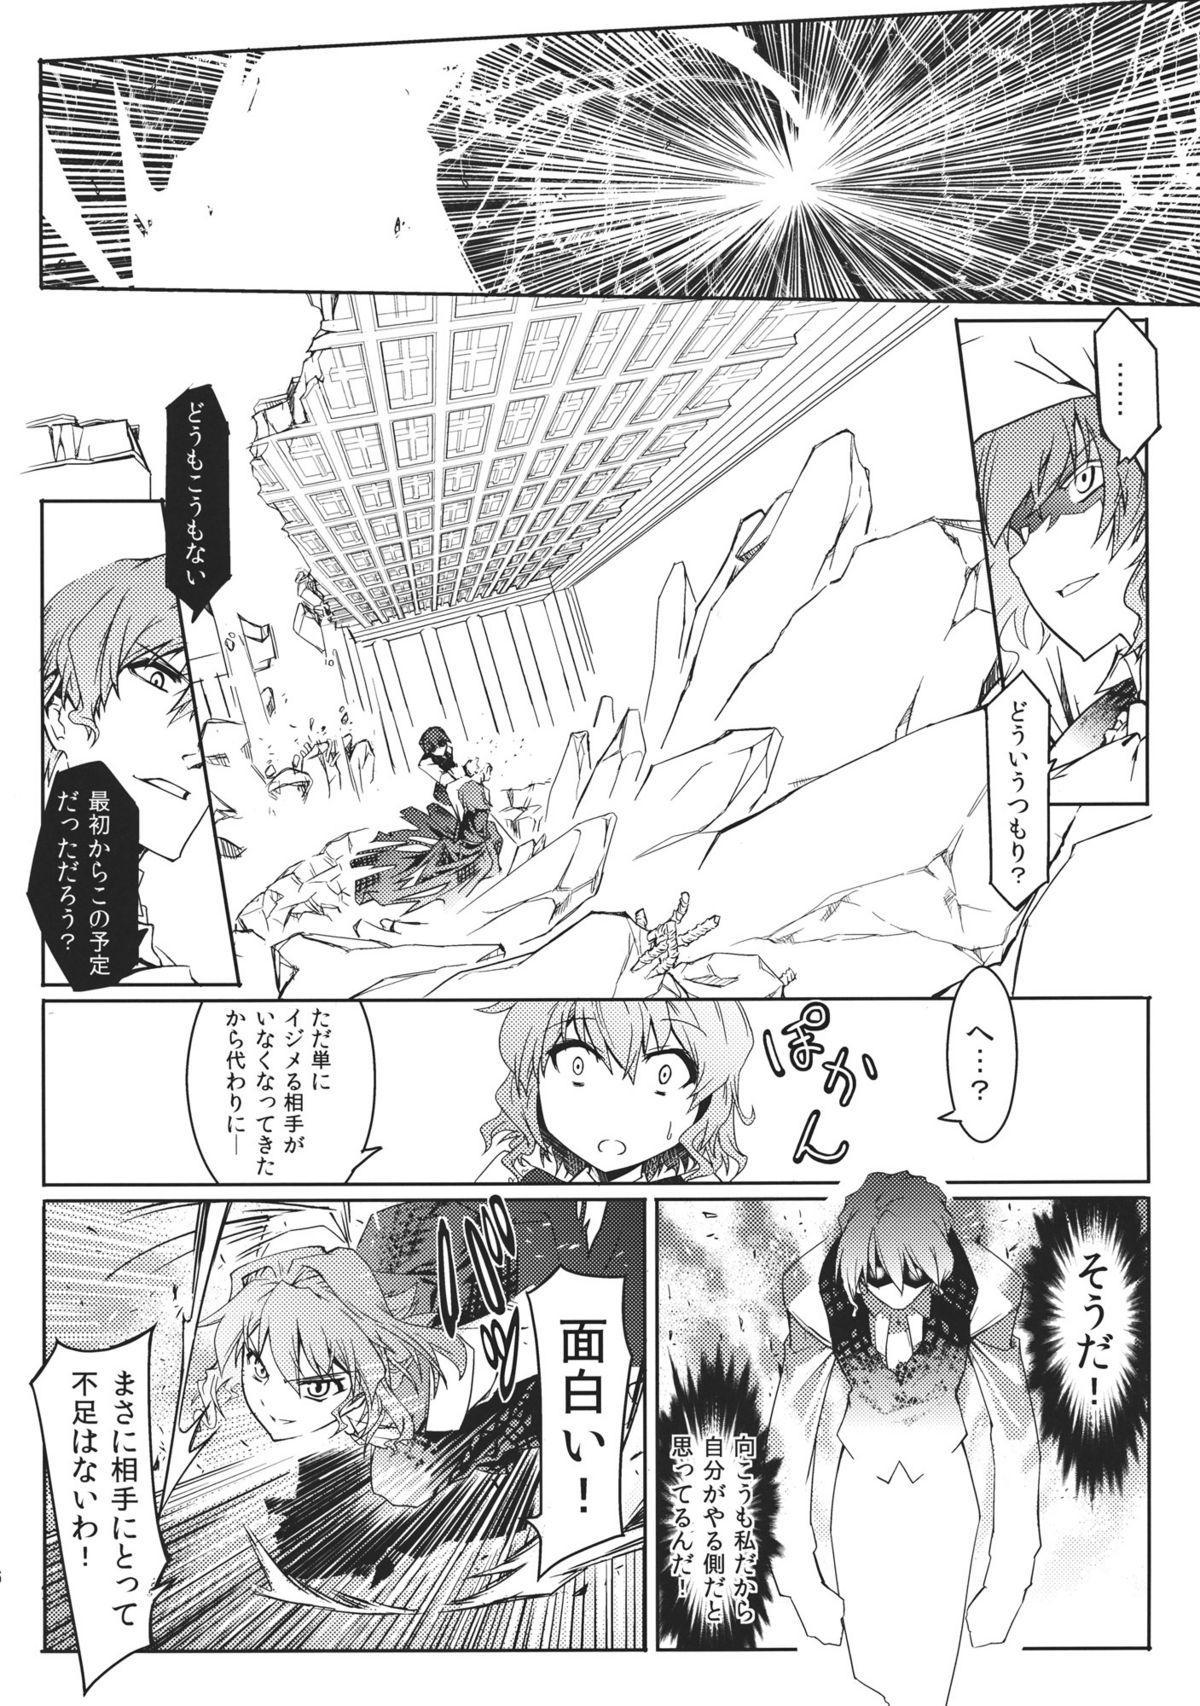 Kazami-ke Saikyou Densetsu R 7